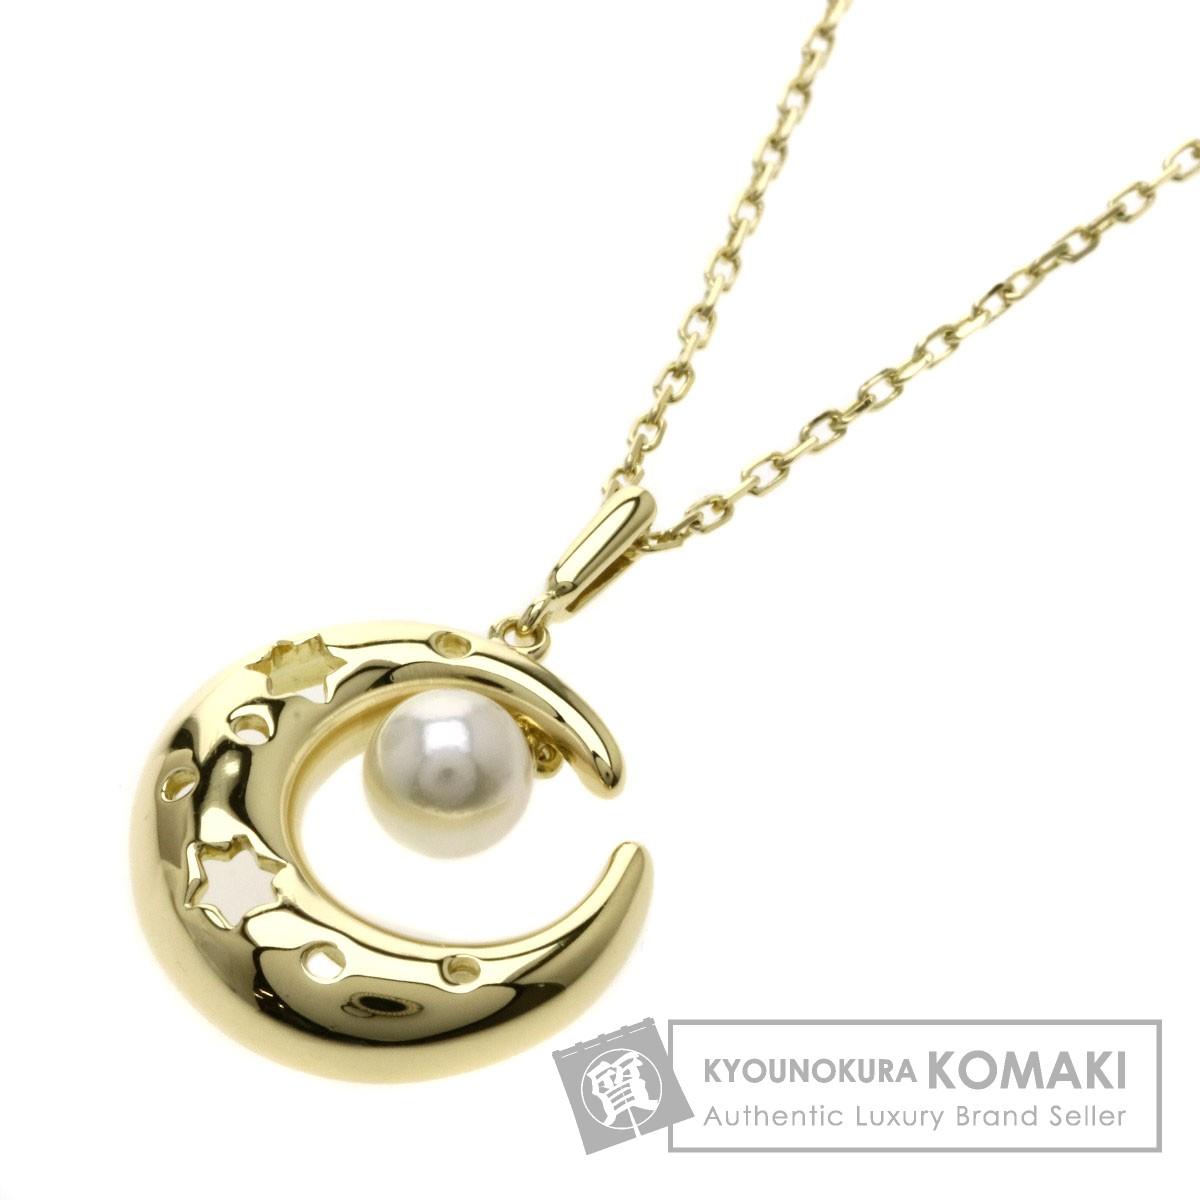 MIKIMOTO パール/真珠 ネックレス K18YG レディース 【中古】【ミキモト】